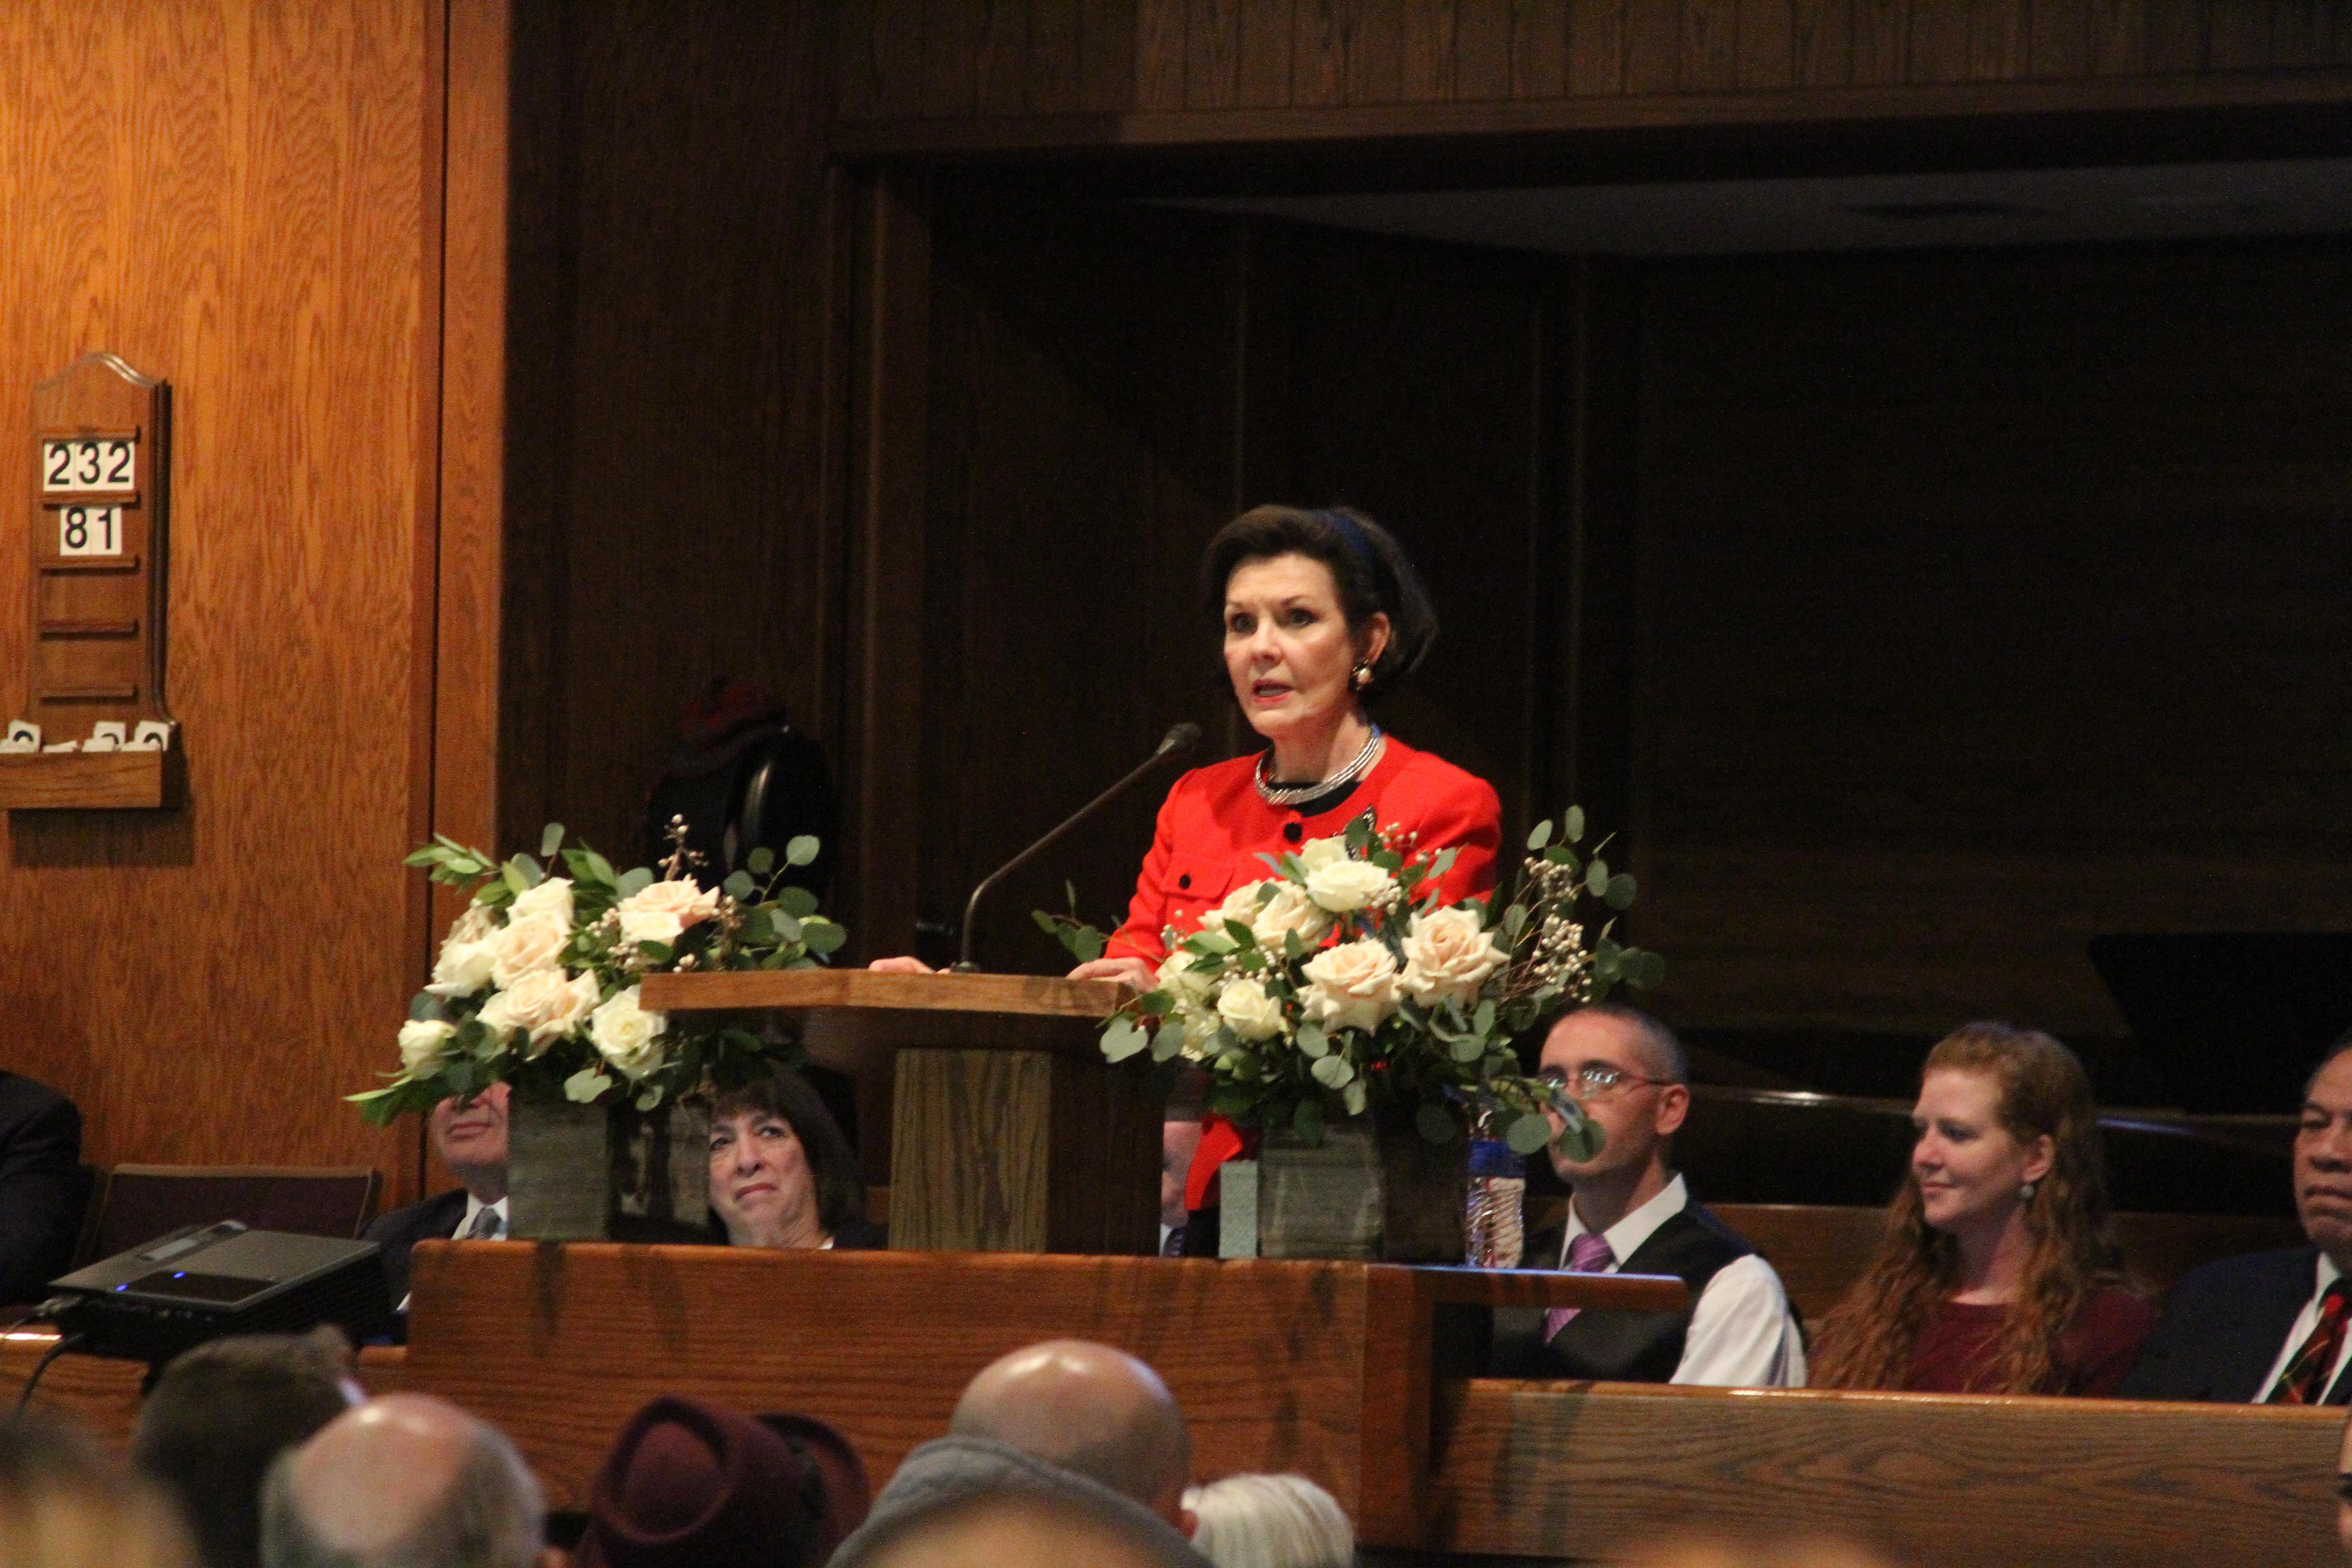 Sister Kristin Oaks speaks during a Holladay Region Mid-Single Adult Fireside on Jan. 13, 2019.